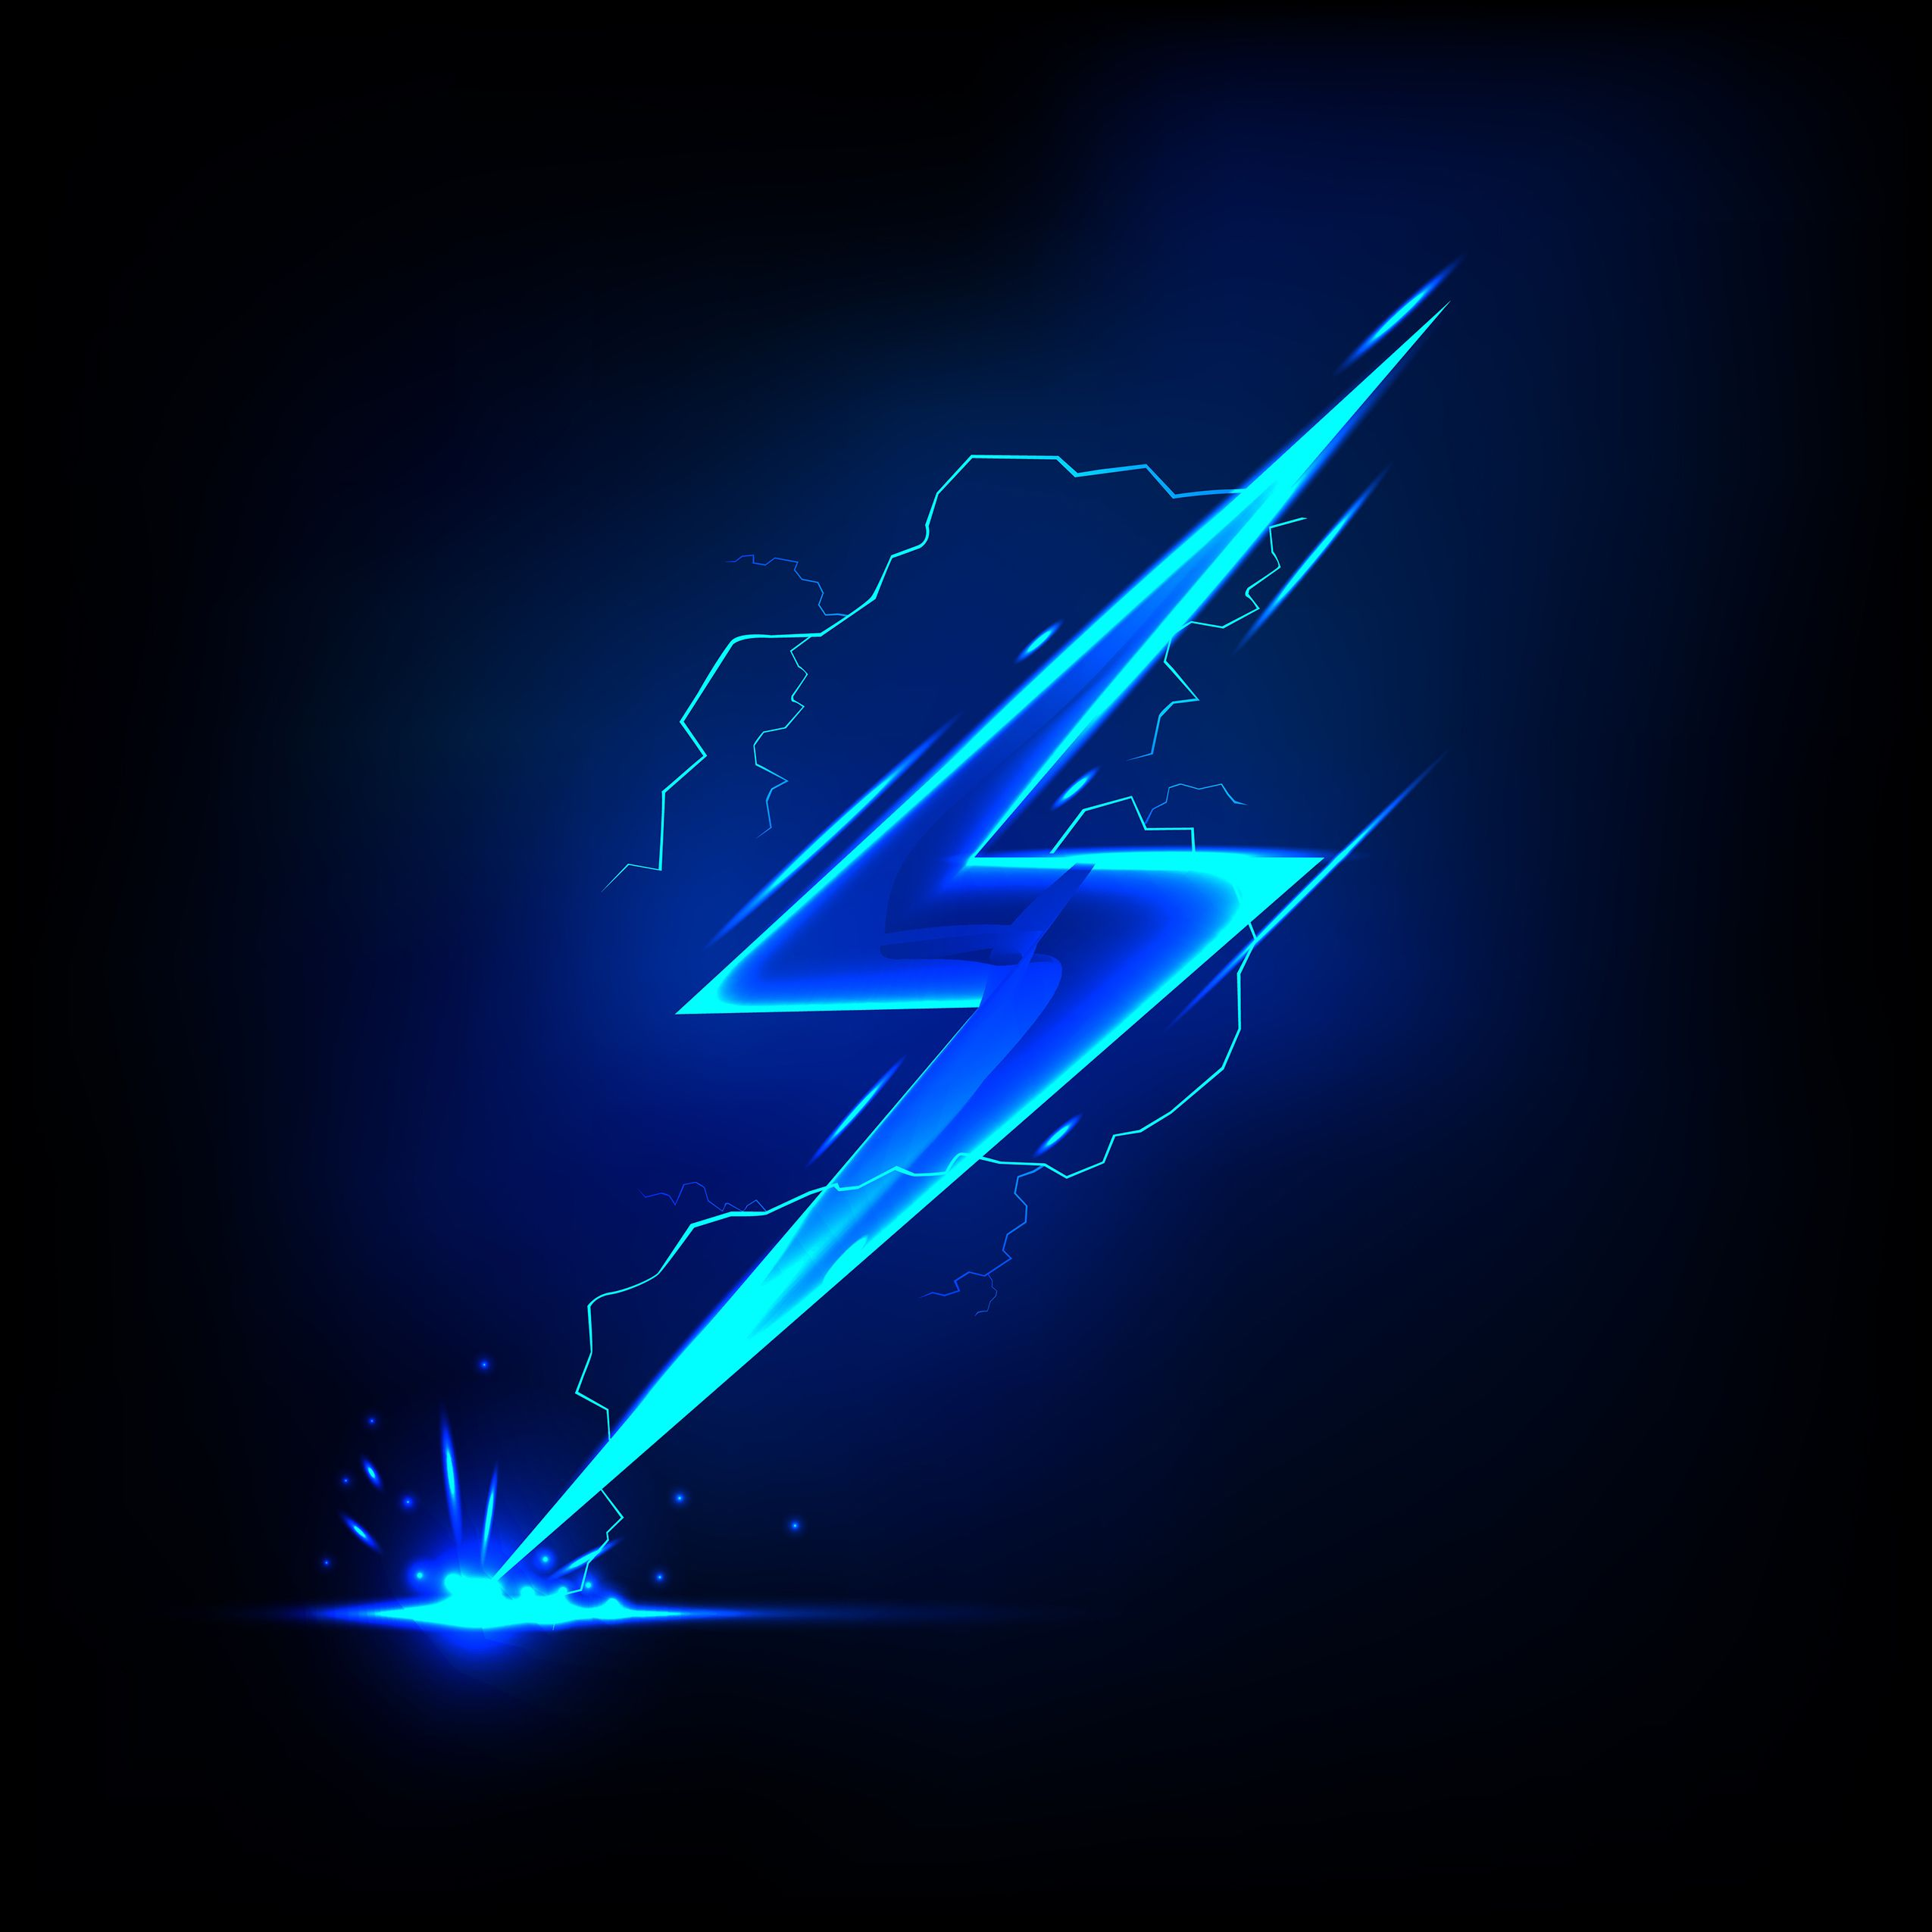 Pin by Noah on My blog Flash wallpaper, Lightning bolt